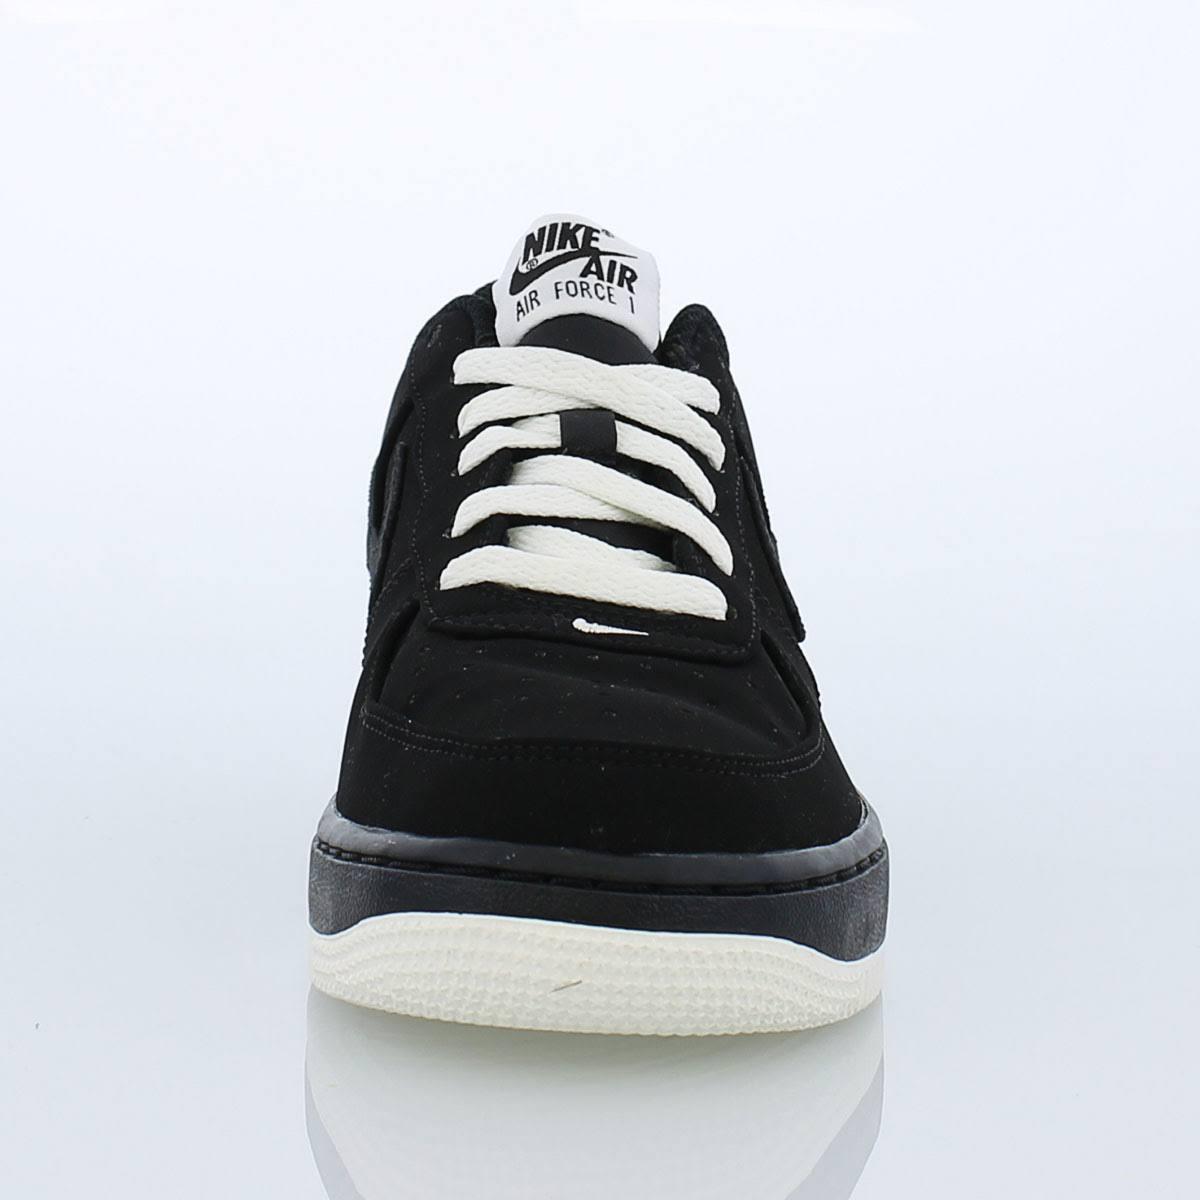 Zapatilla Boy's Force Nike Baja Baloncesto 1 Air De sail Negra Negra wZIqSqpg